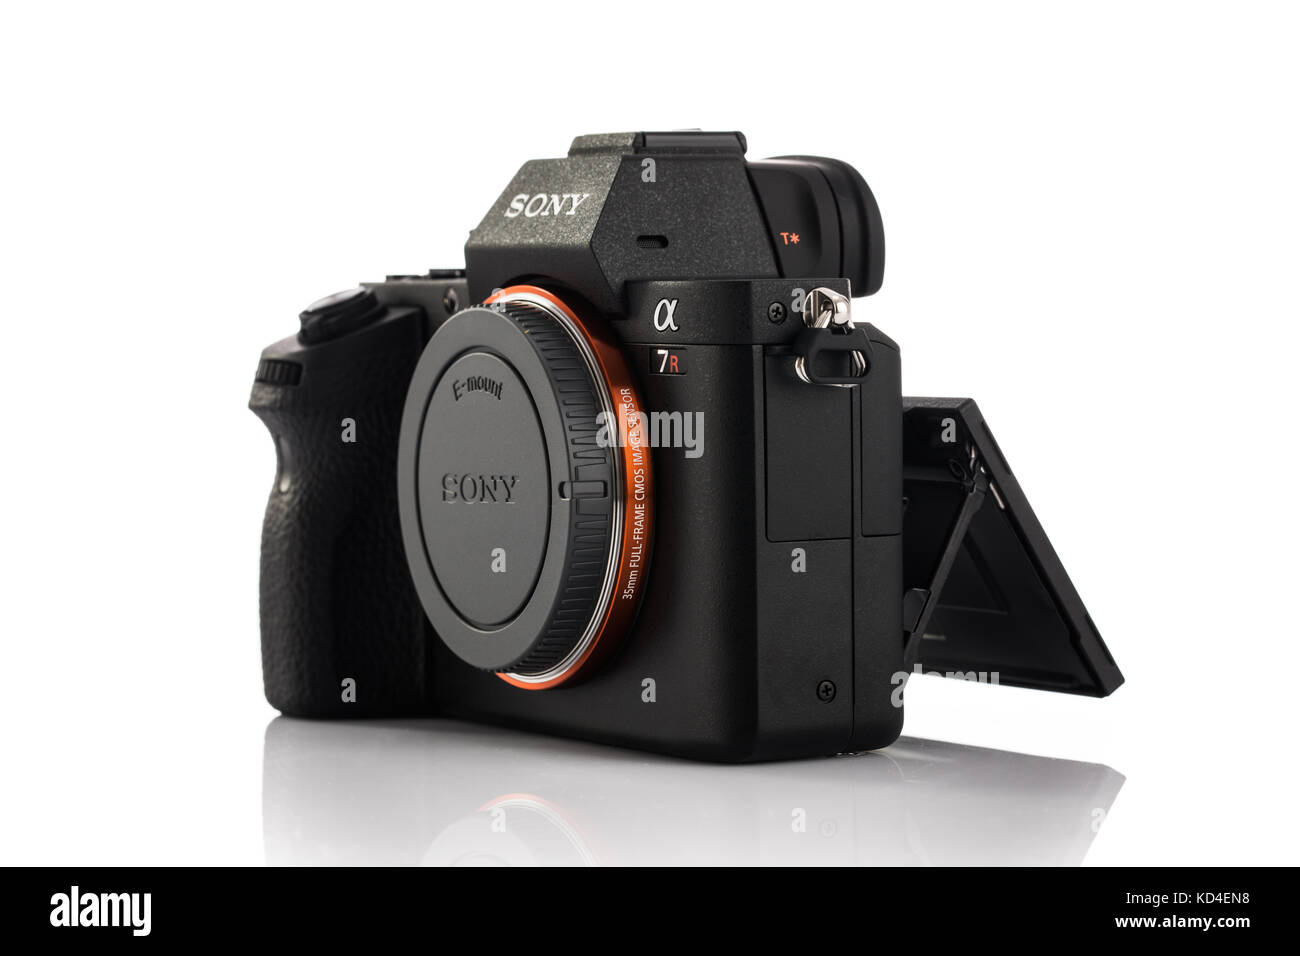 Sony A7r Ii Imágenes De Stock & Sony A7r Ii Fotos De Stock - Alamy